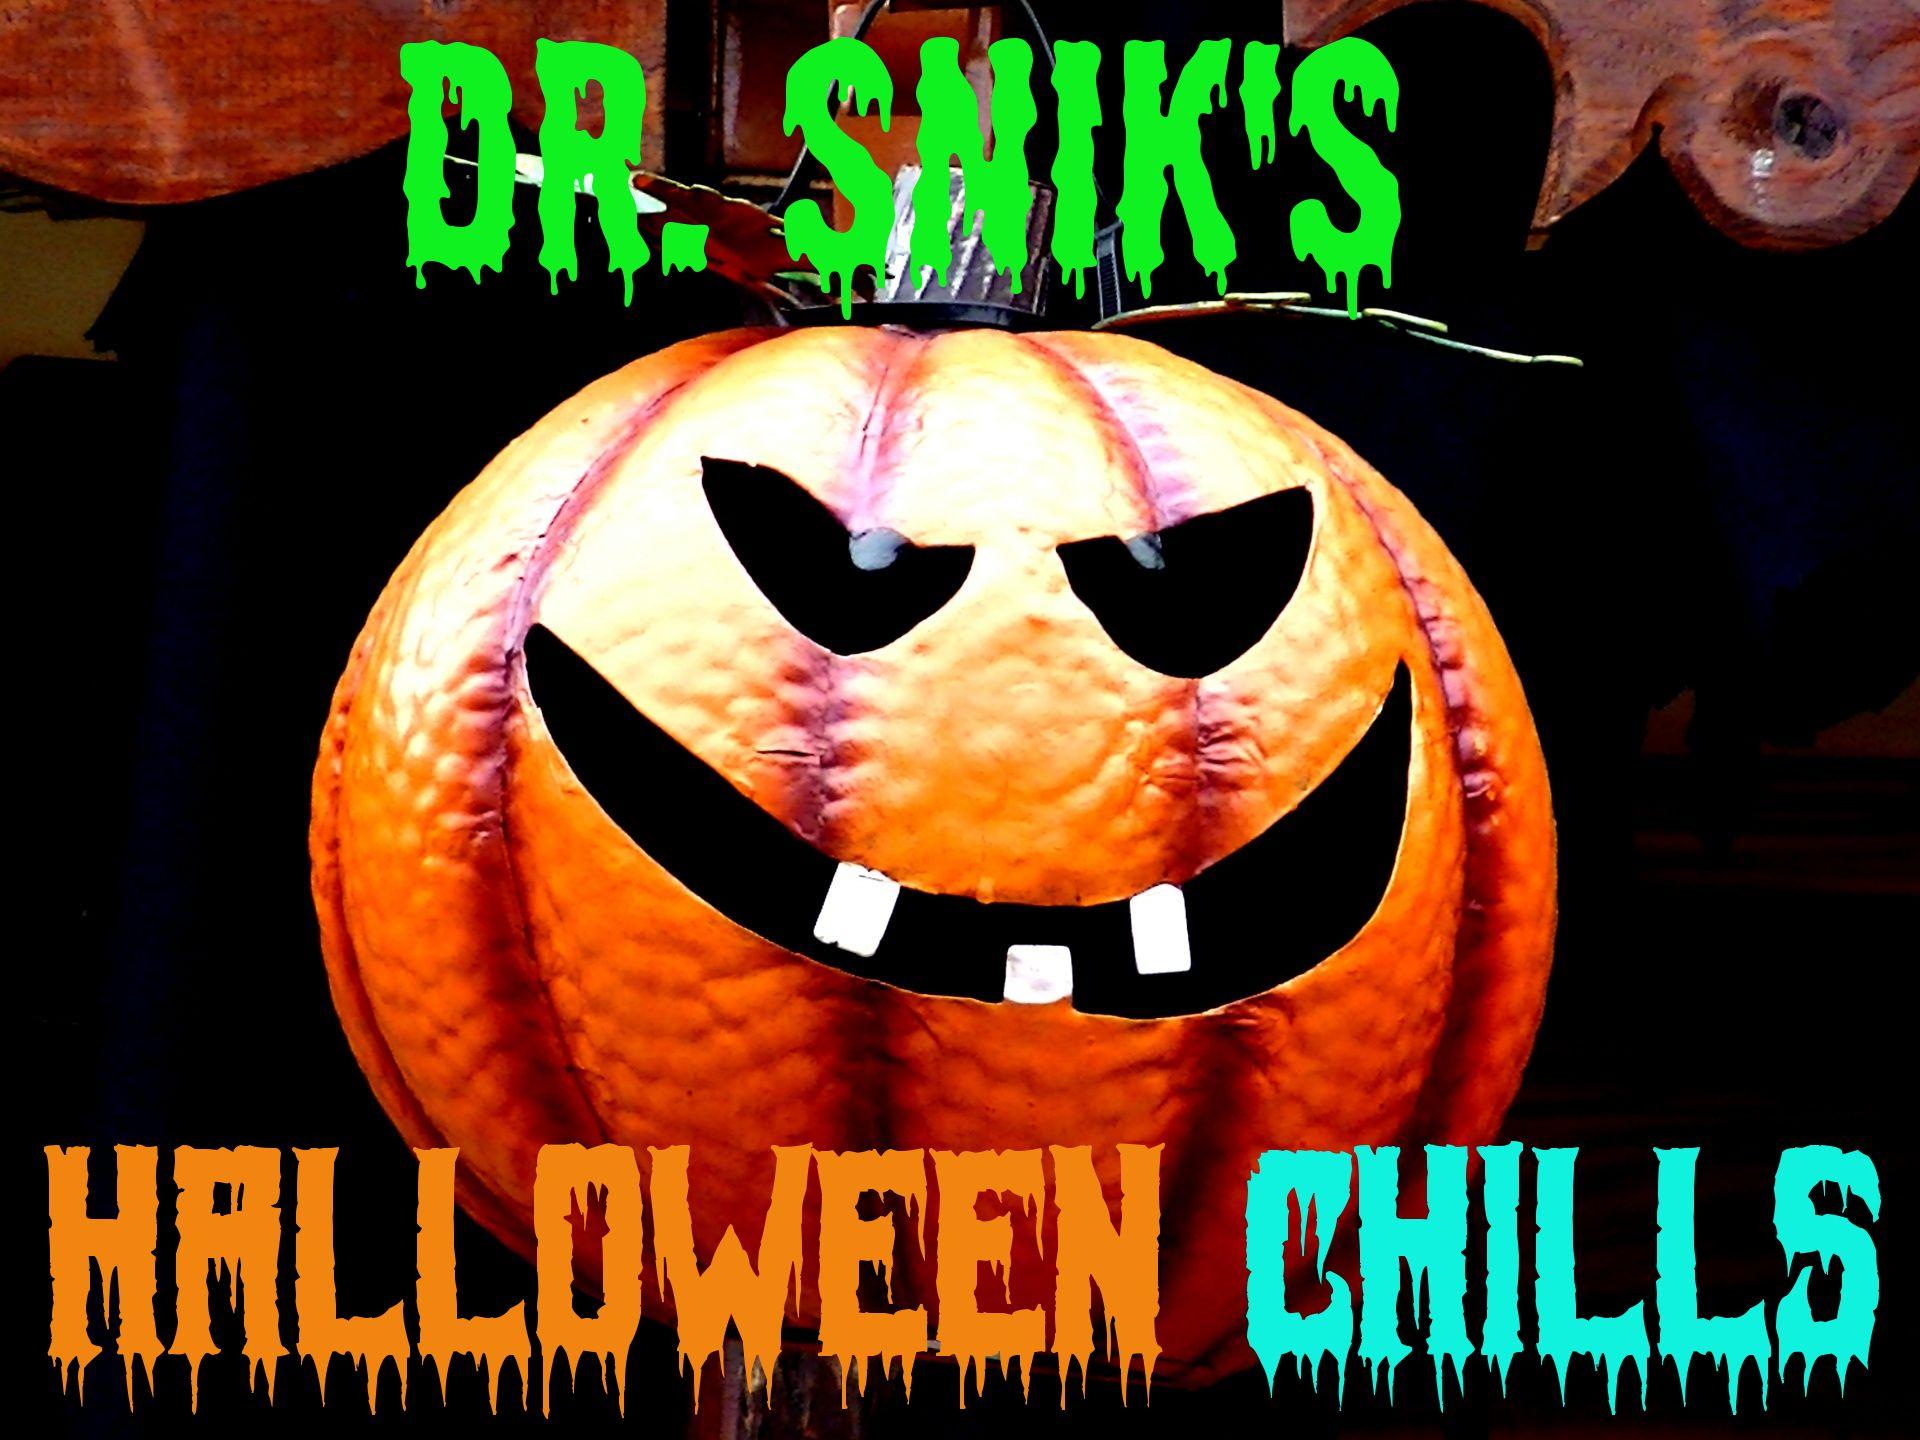 pindr. snik's halloween chills on dr. snik's halloween chills